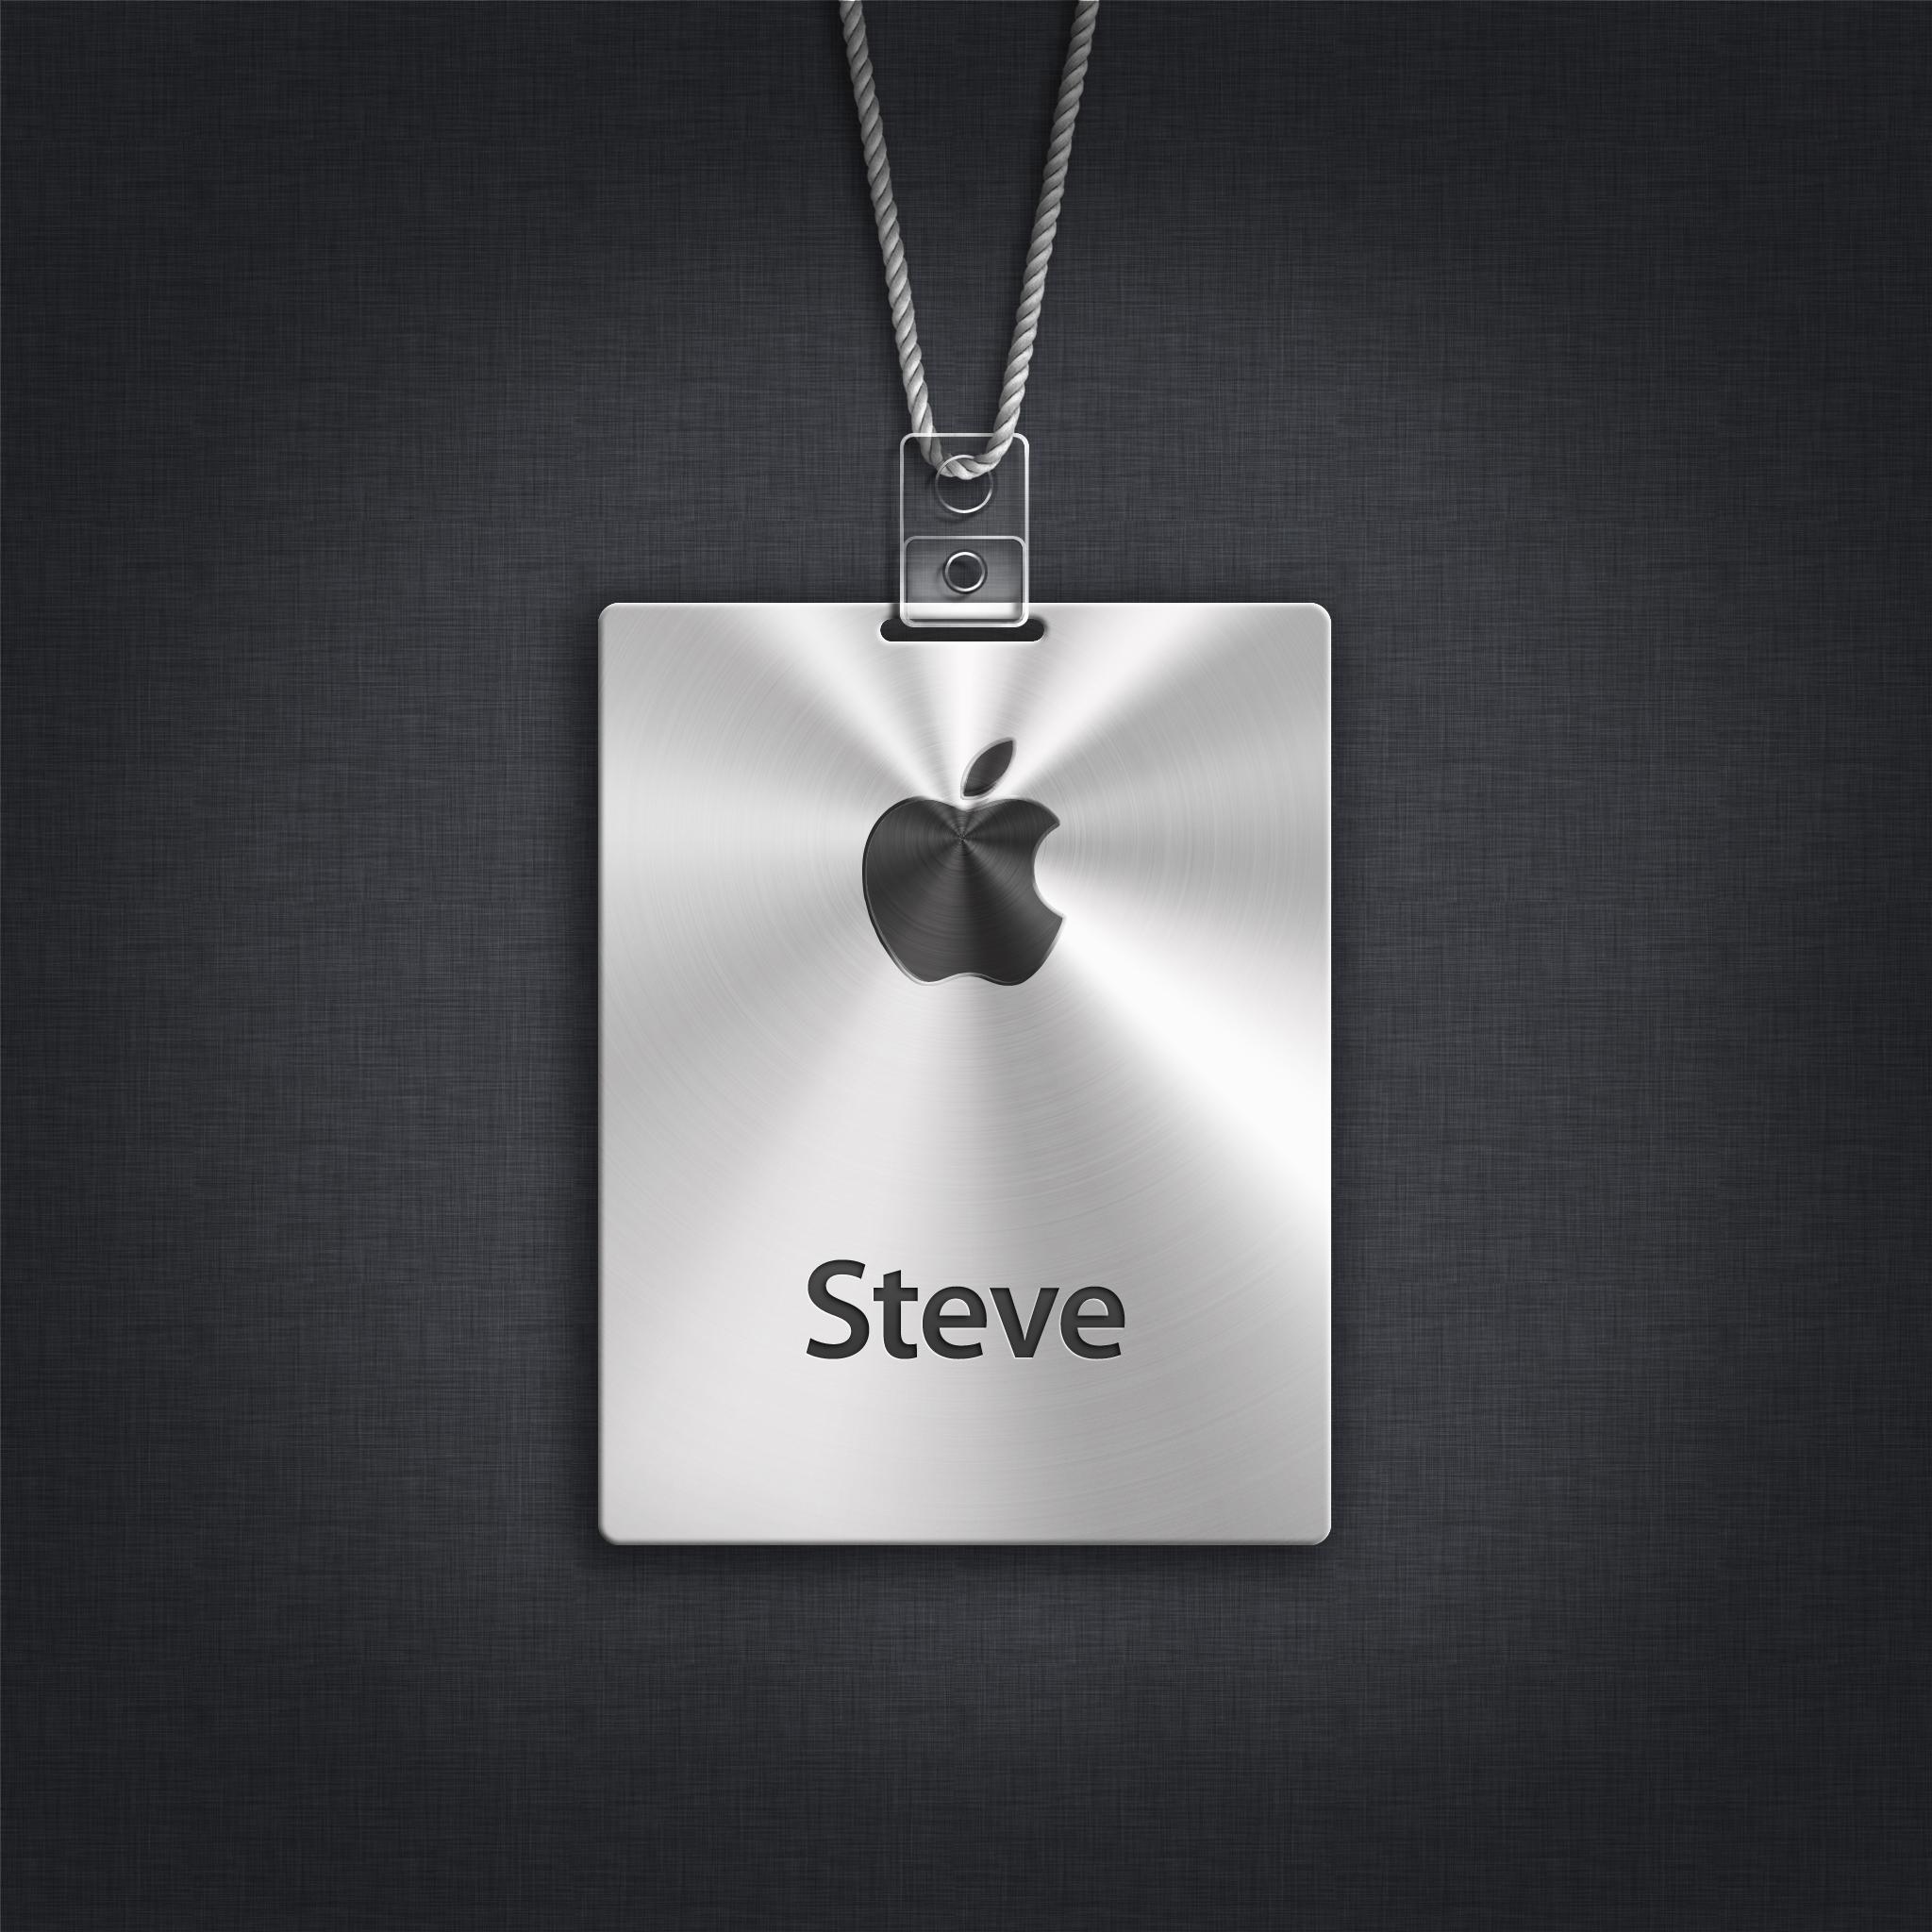 Apple-Steve-Store-3Wallpapers-iPad-Retina